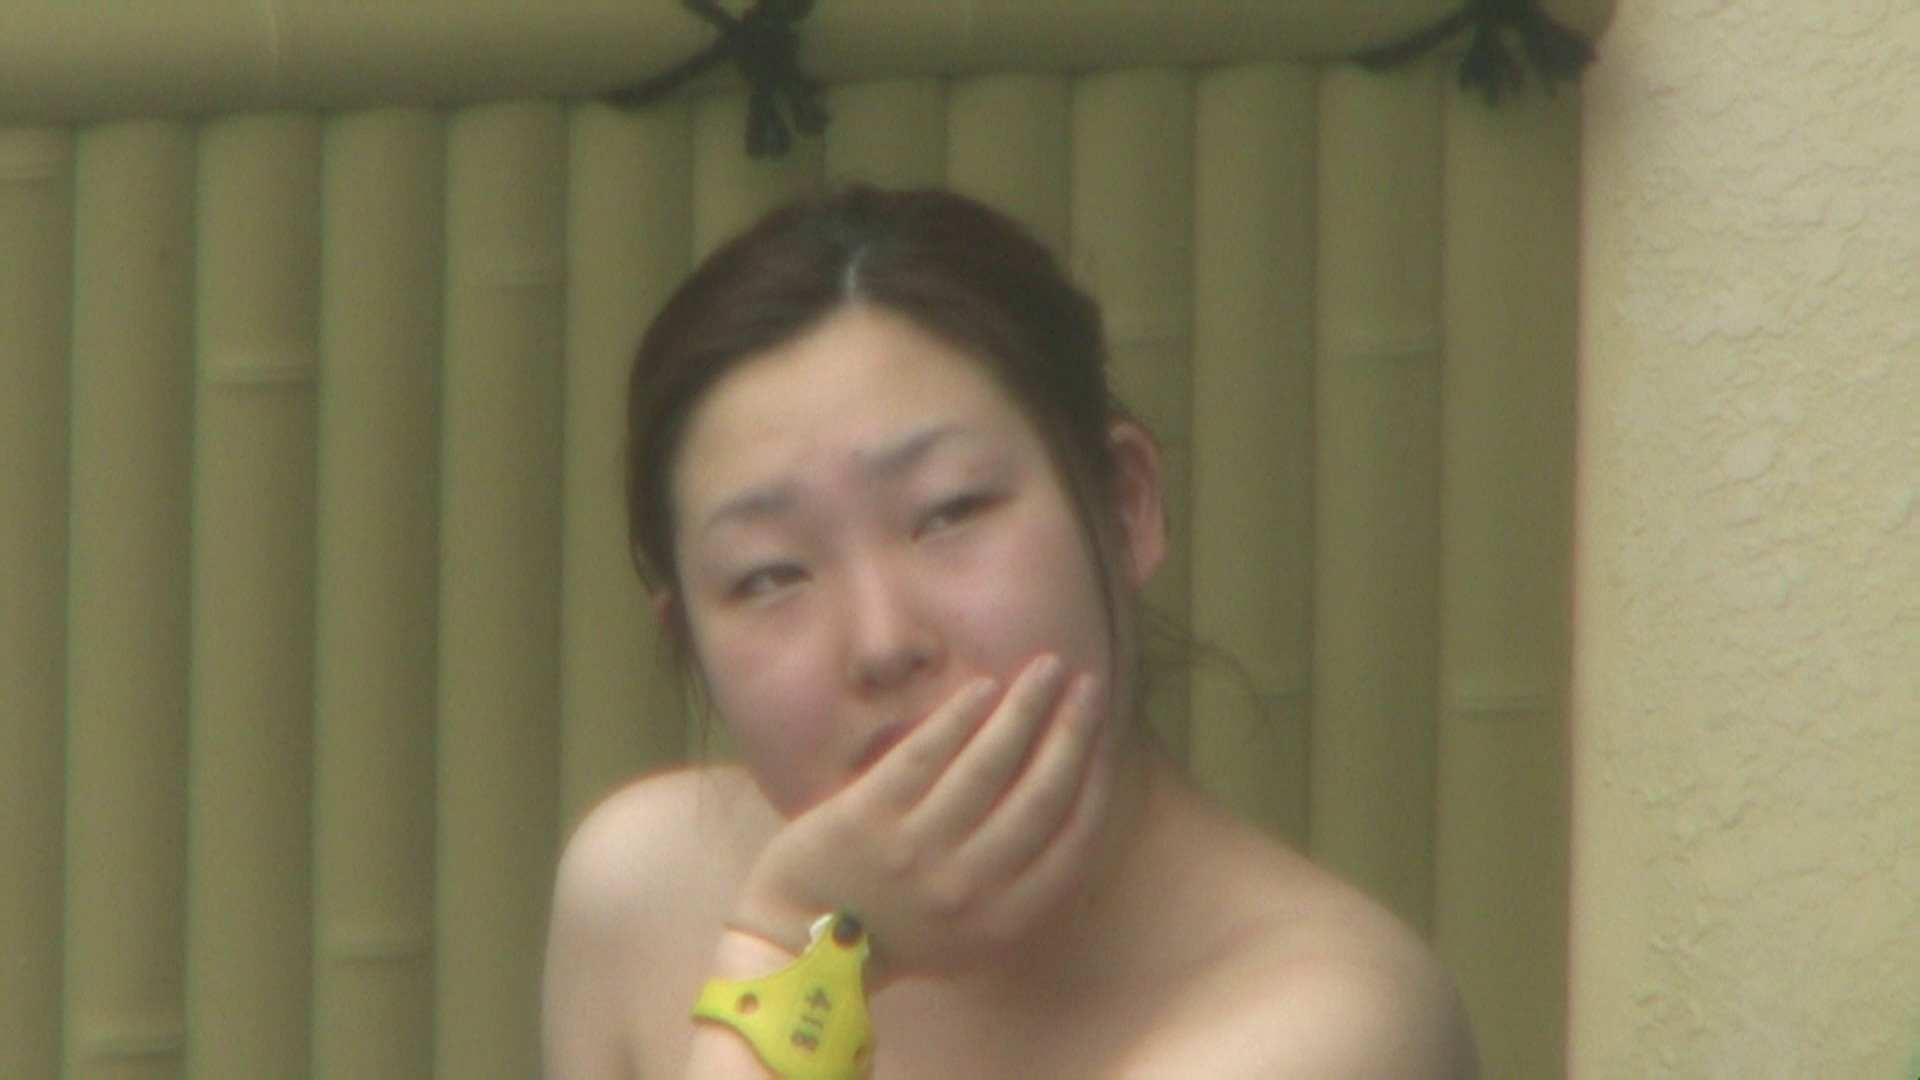 Aquaな露天風呂Vol.72【VIP限定】 露天風呂編  98PIX 72